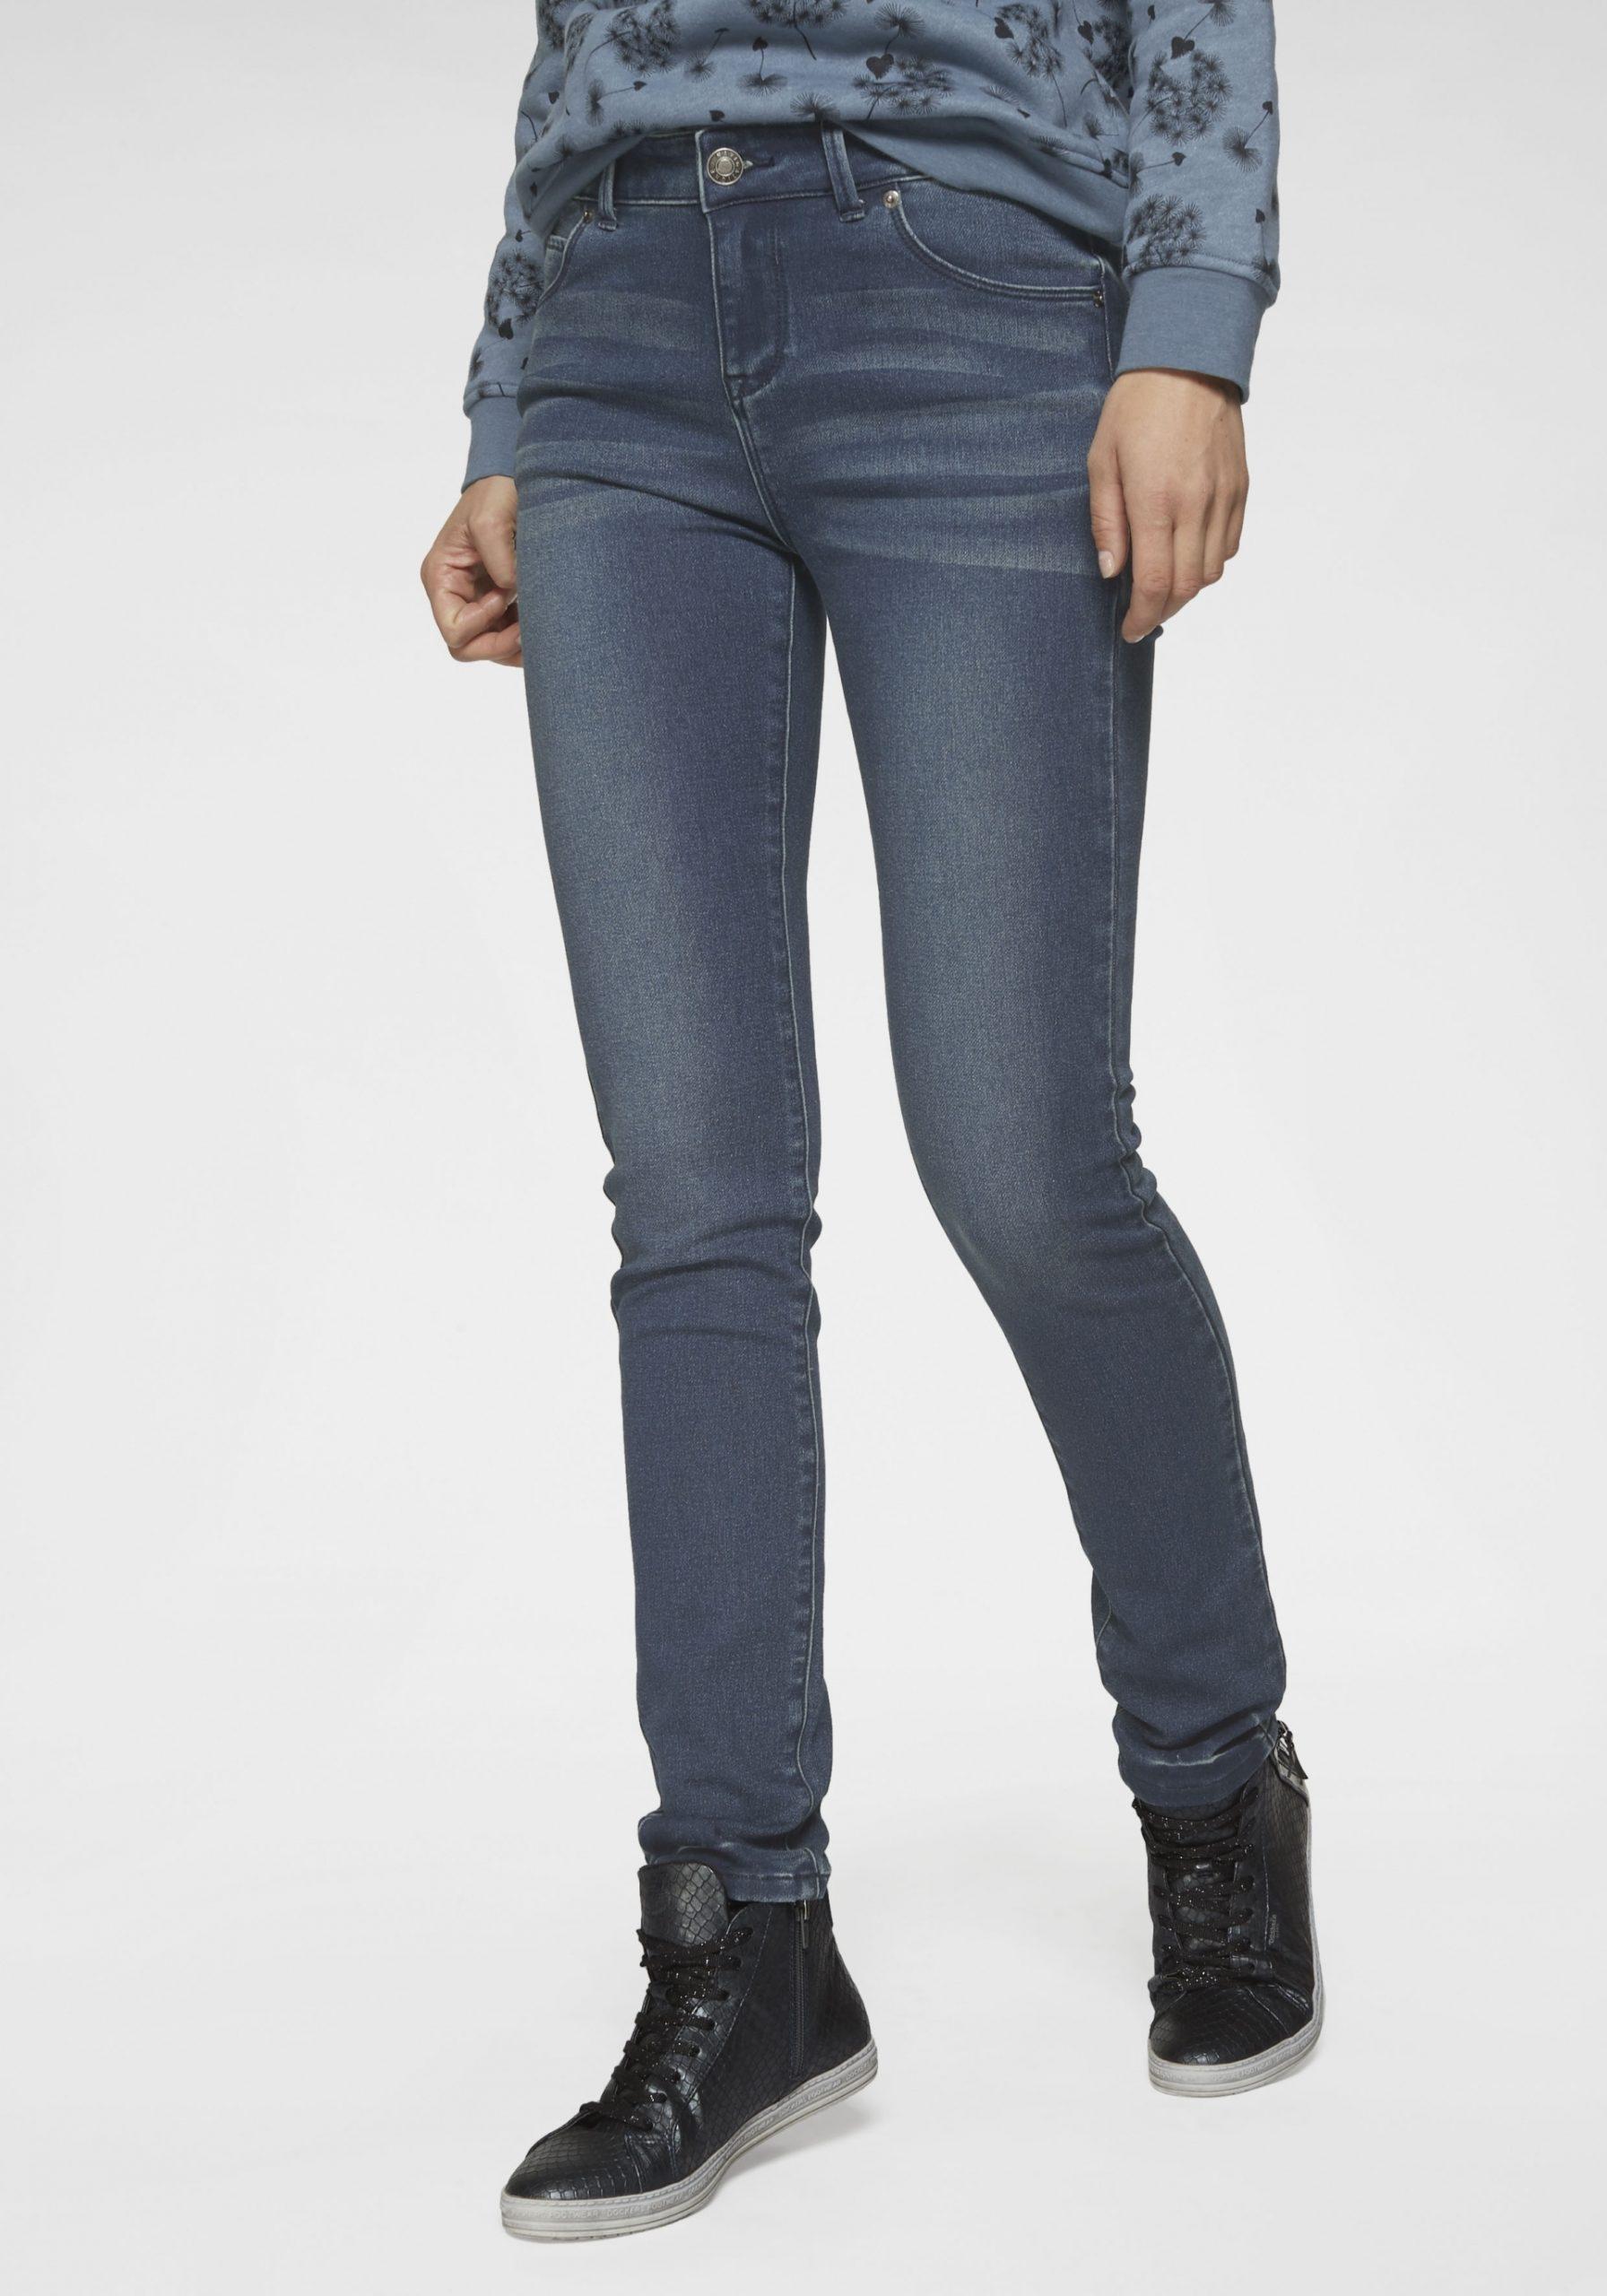 Damen Elastische Slim-Fit-Jeans dunkelblau